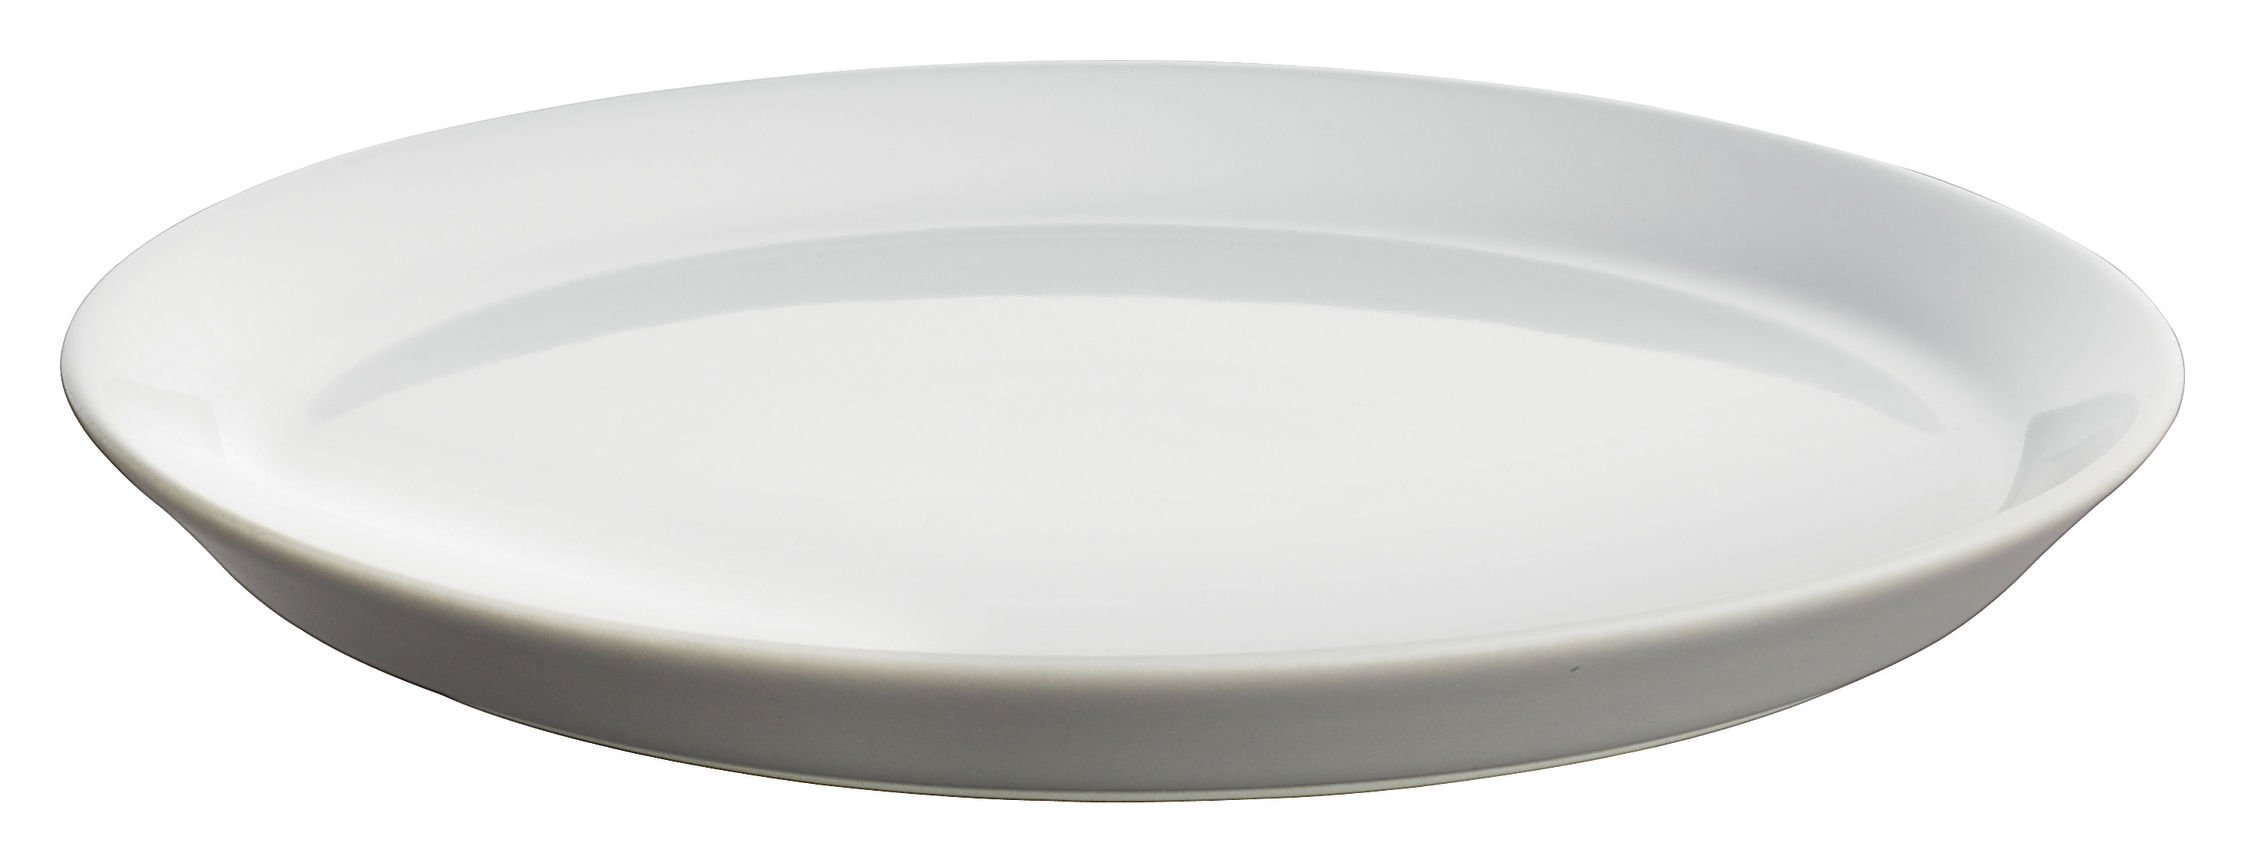 Tableware - Plates - Tonale Dessert plate by Alessi - Light grey - Stoneware ceramic